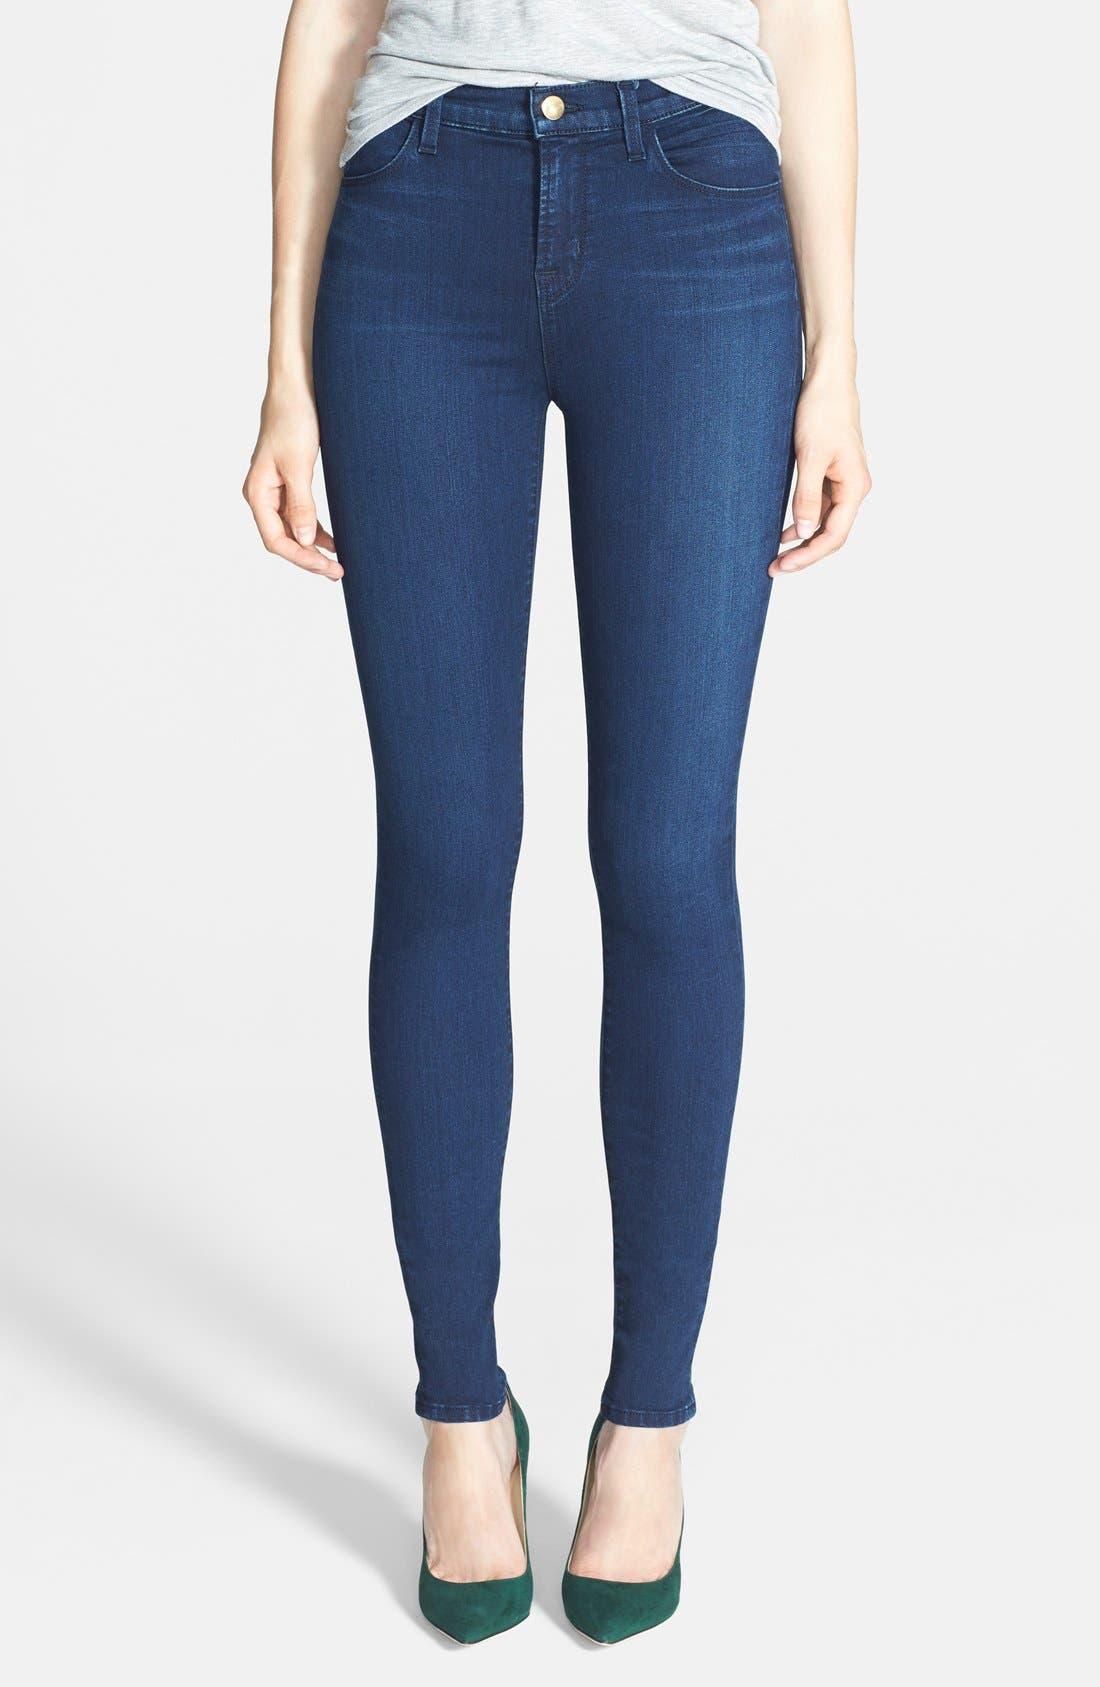 Main Image - J Brand 'Maria' High Rise Skinny Jeans (Maria Destiny)